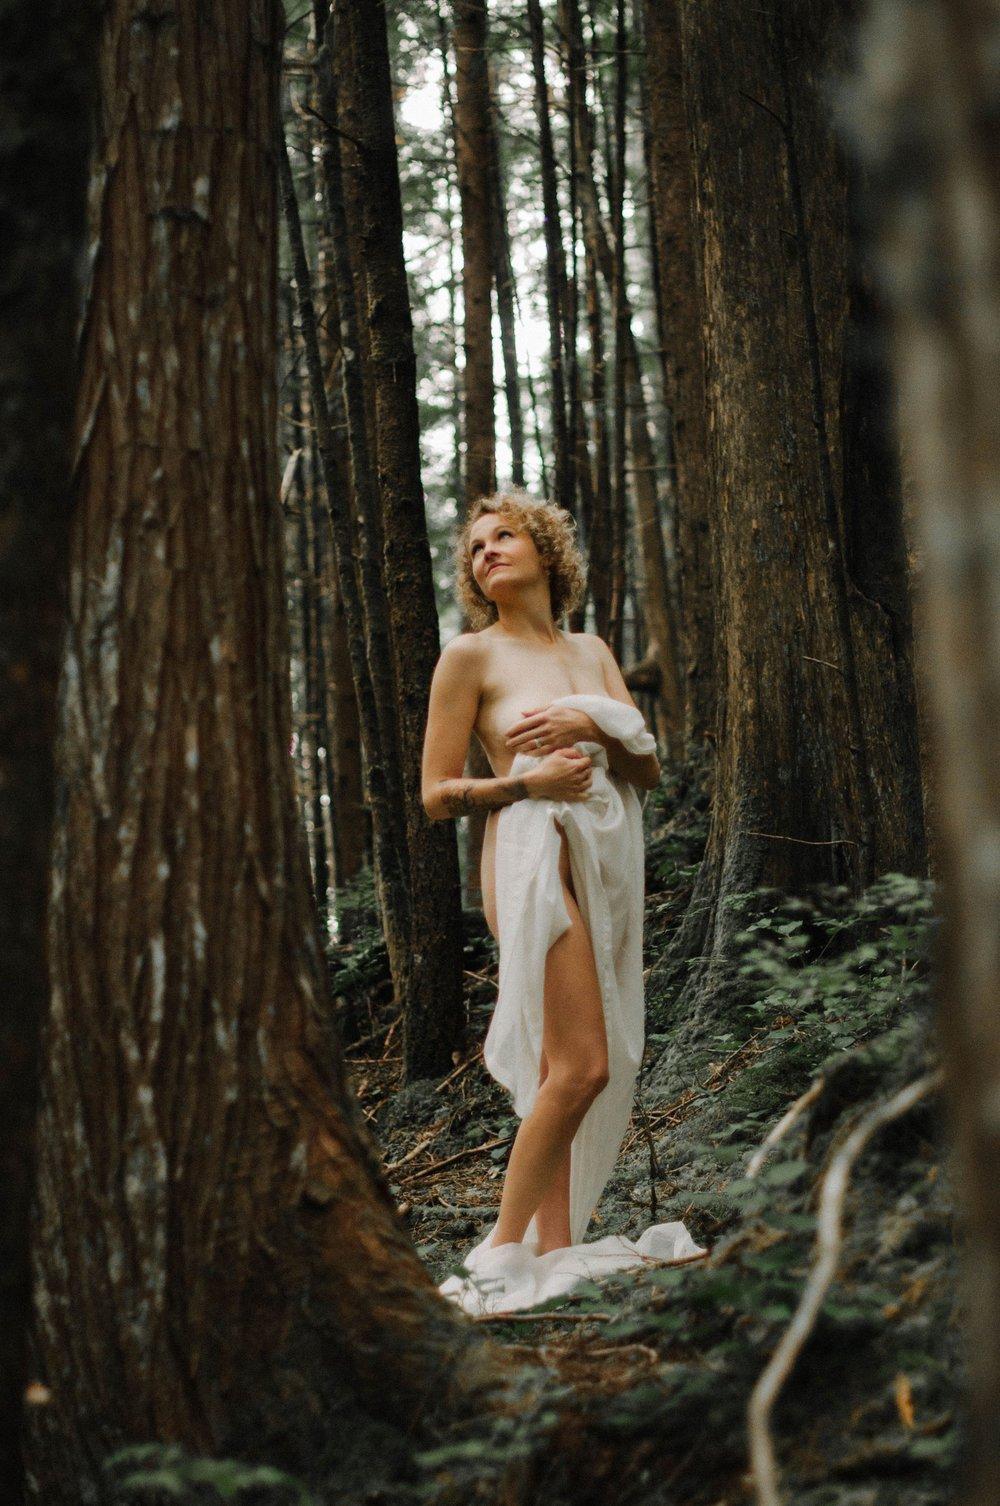 Boudoir Collective Fine Art Boudoir Blog and Magazine The Loud Camera Outdoor Forest Boudoir 4.jpg